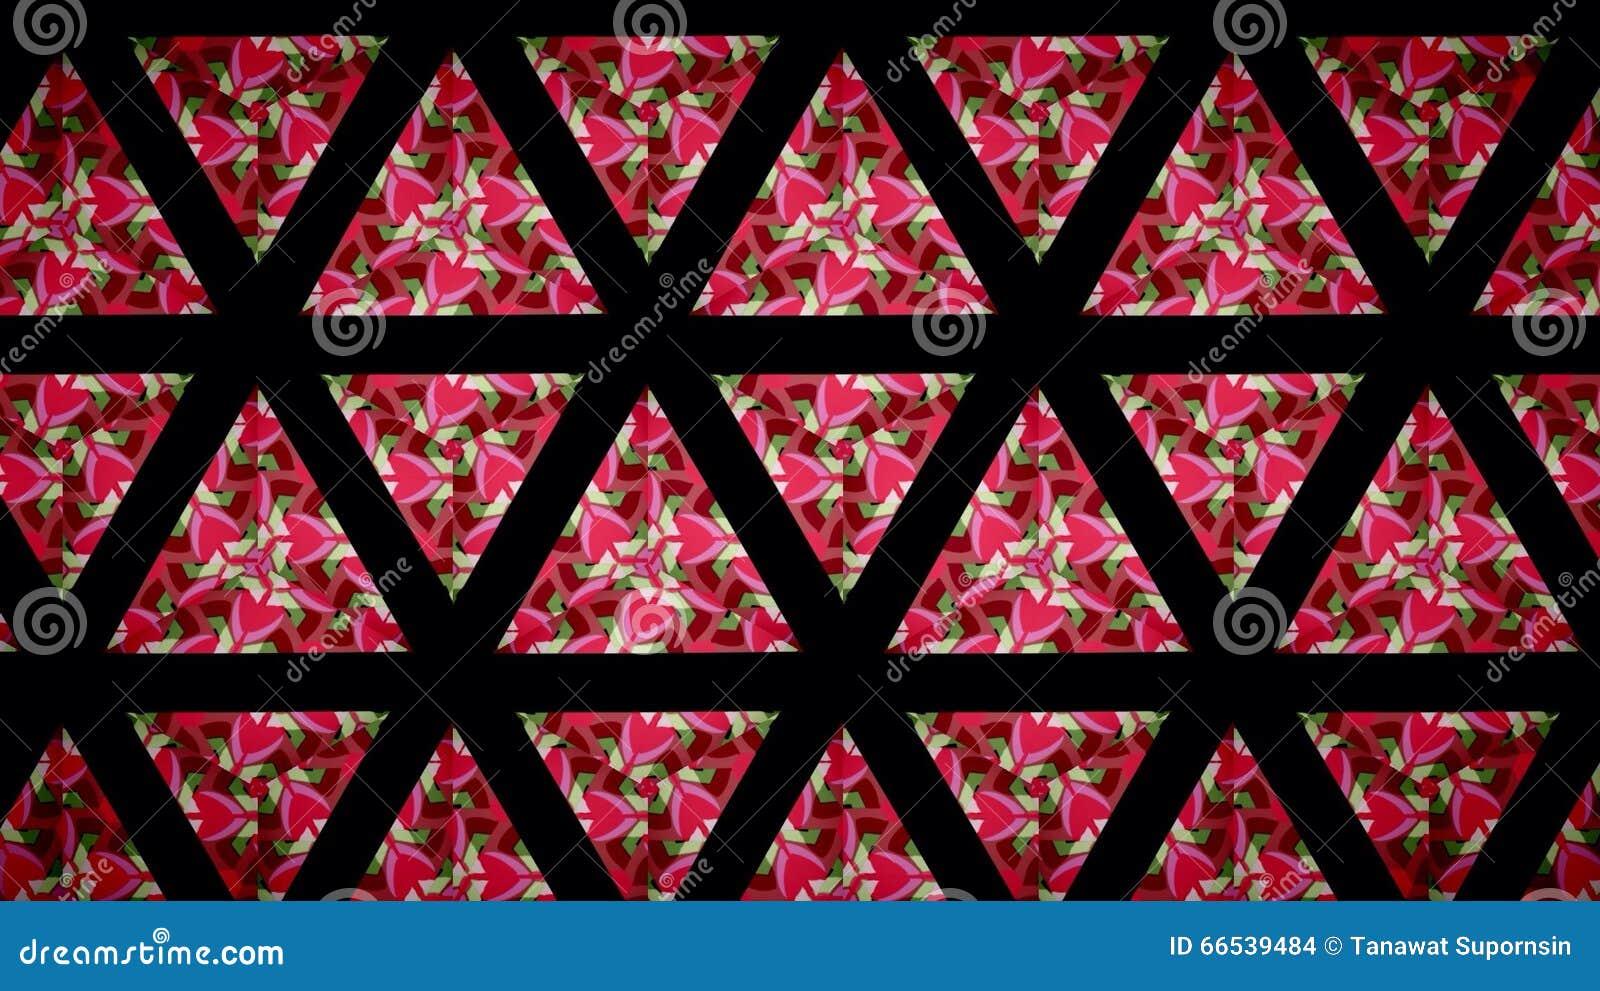 Love Heart Pink Red Green And Black Line Wallpaper Illustration 66539484 Megapixl